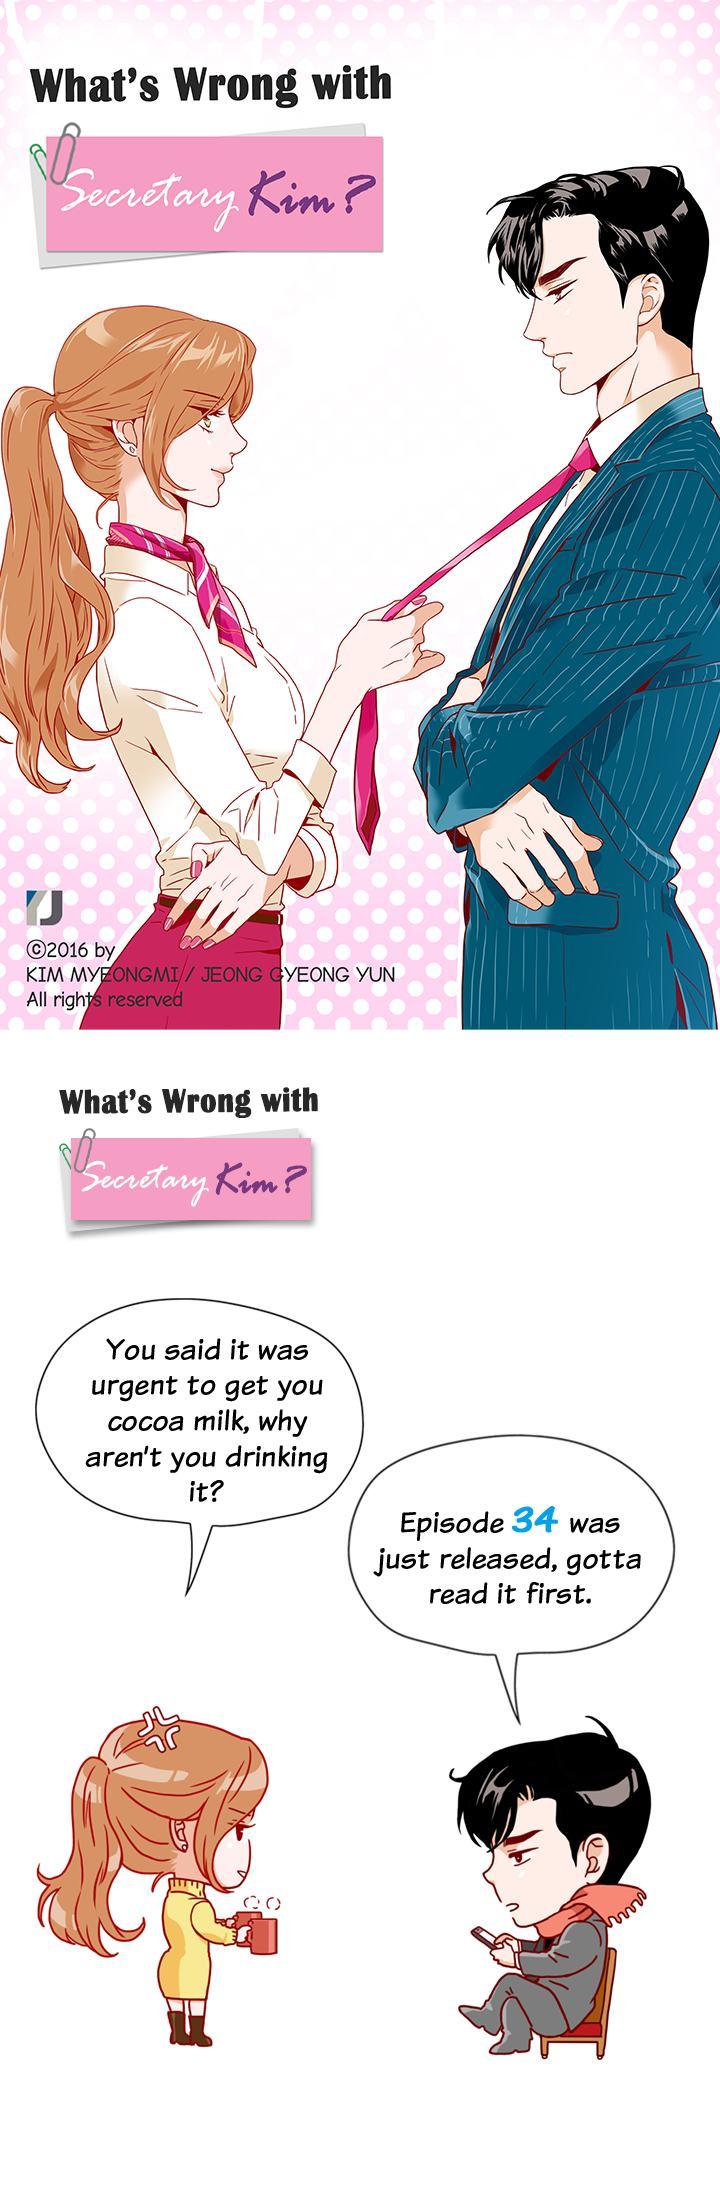 https://manga.mangadogs.com/comics/pic2/15/25807/960691/c1e2effc25370563ca0278b06cfd6e15.jpg Page 1